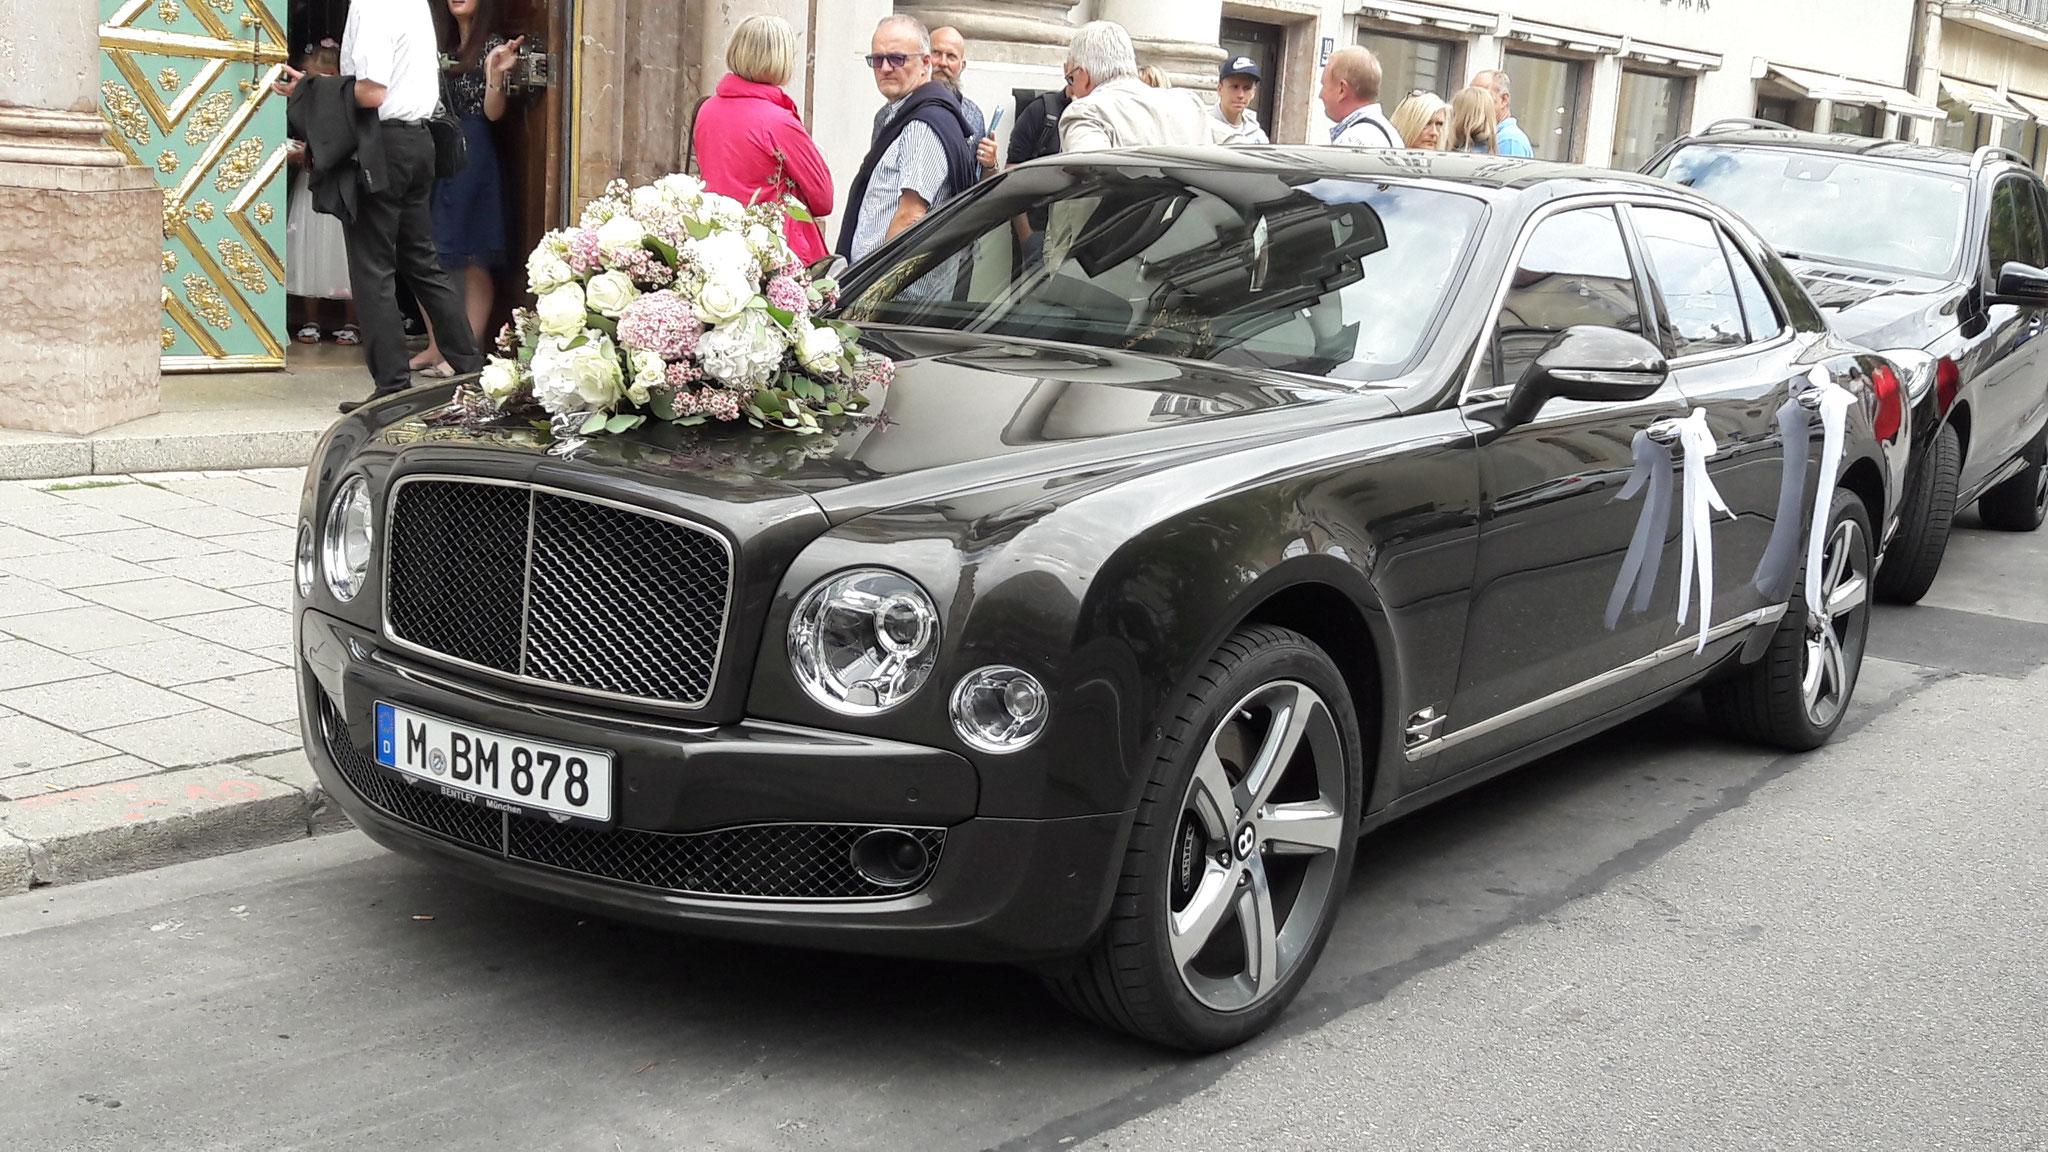 Bentley Mulsanne - M-BM-878